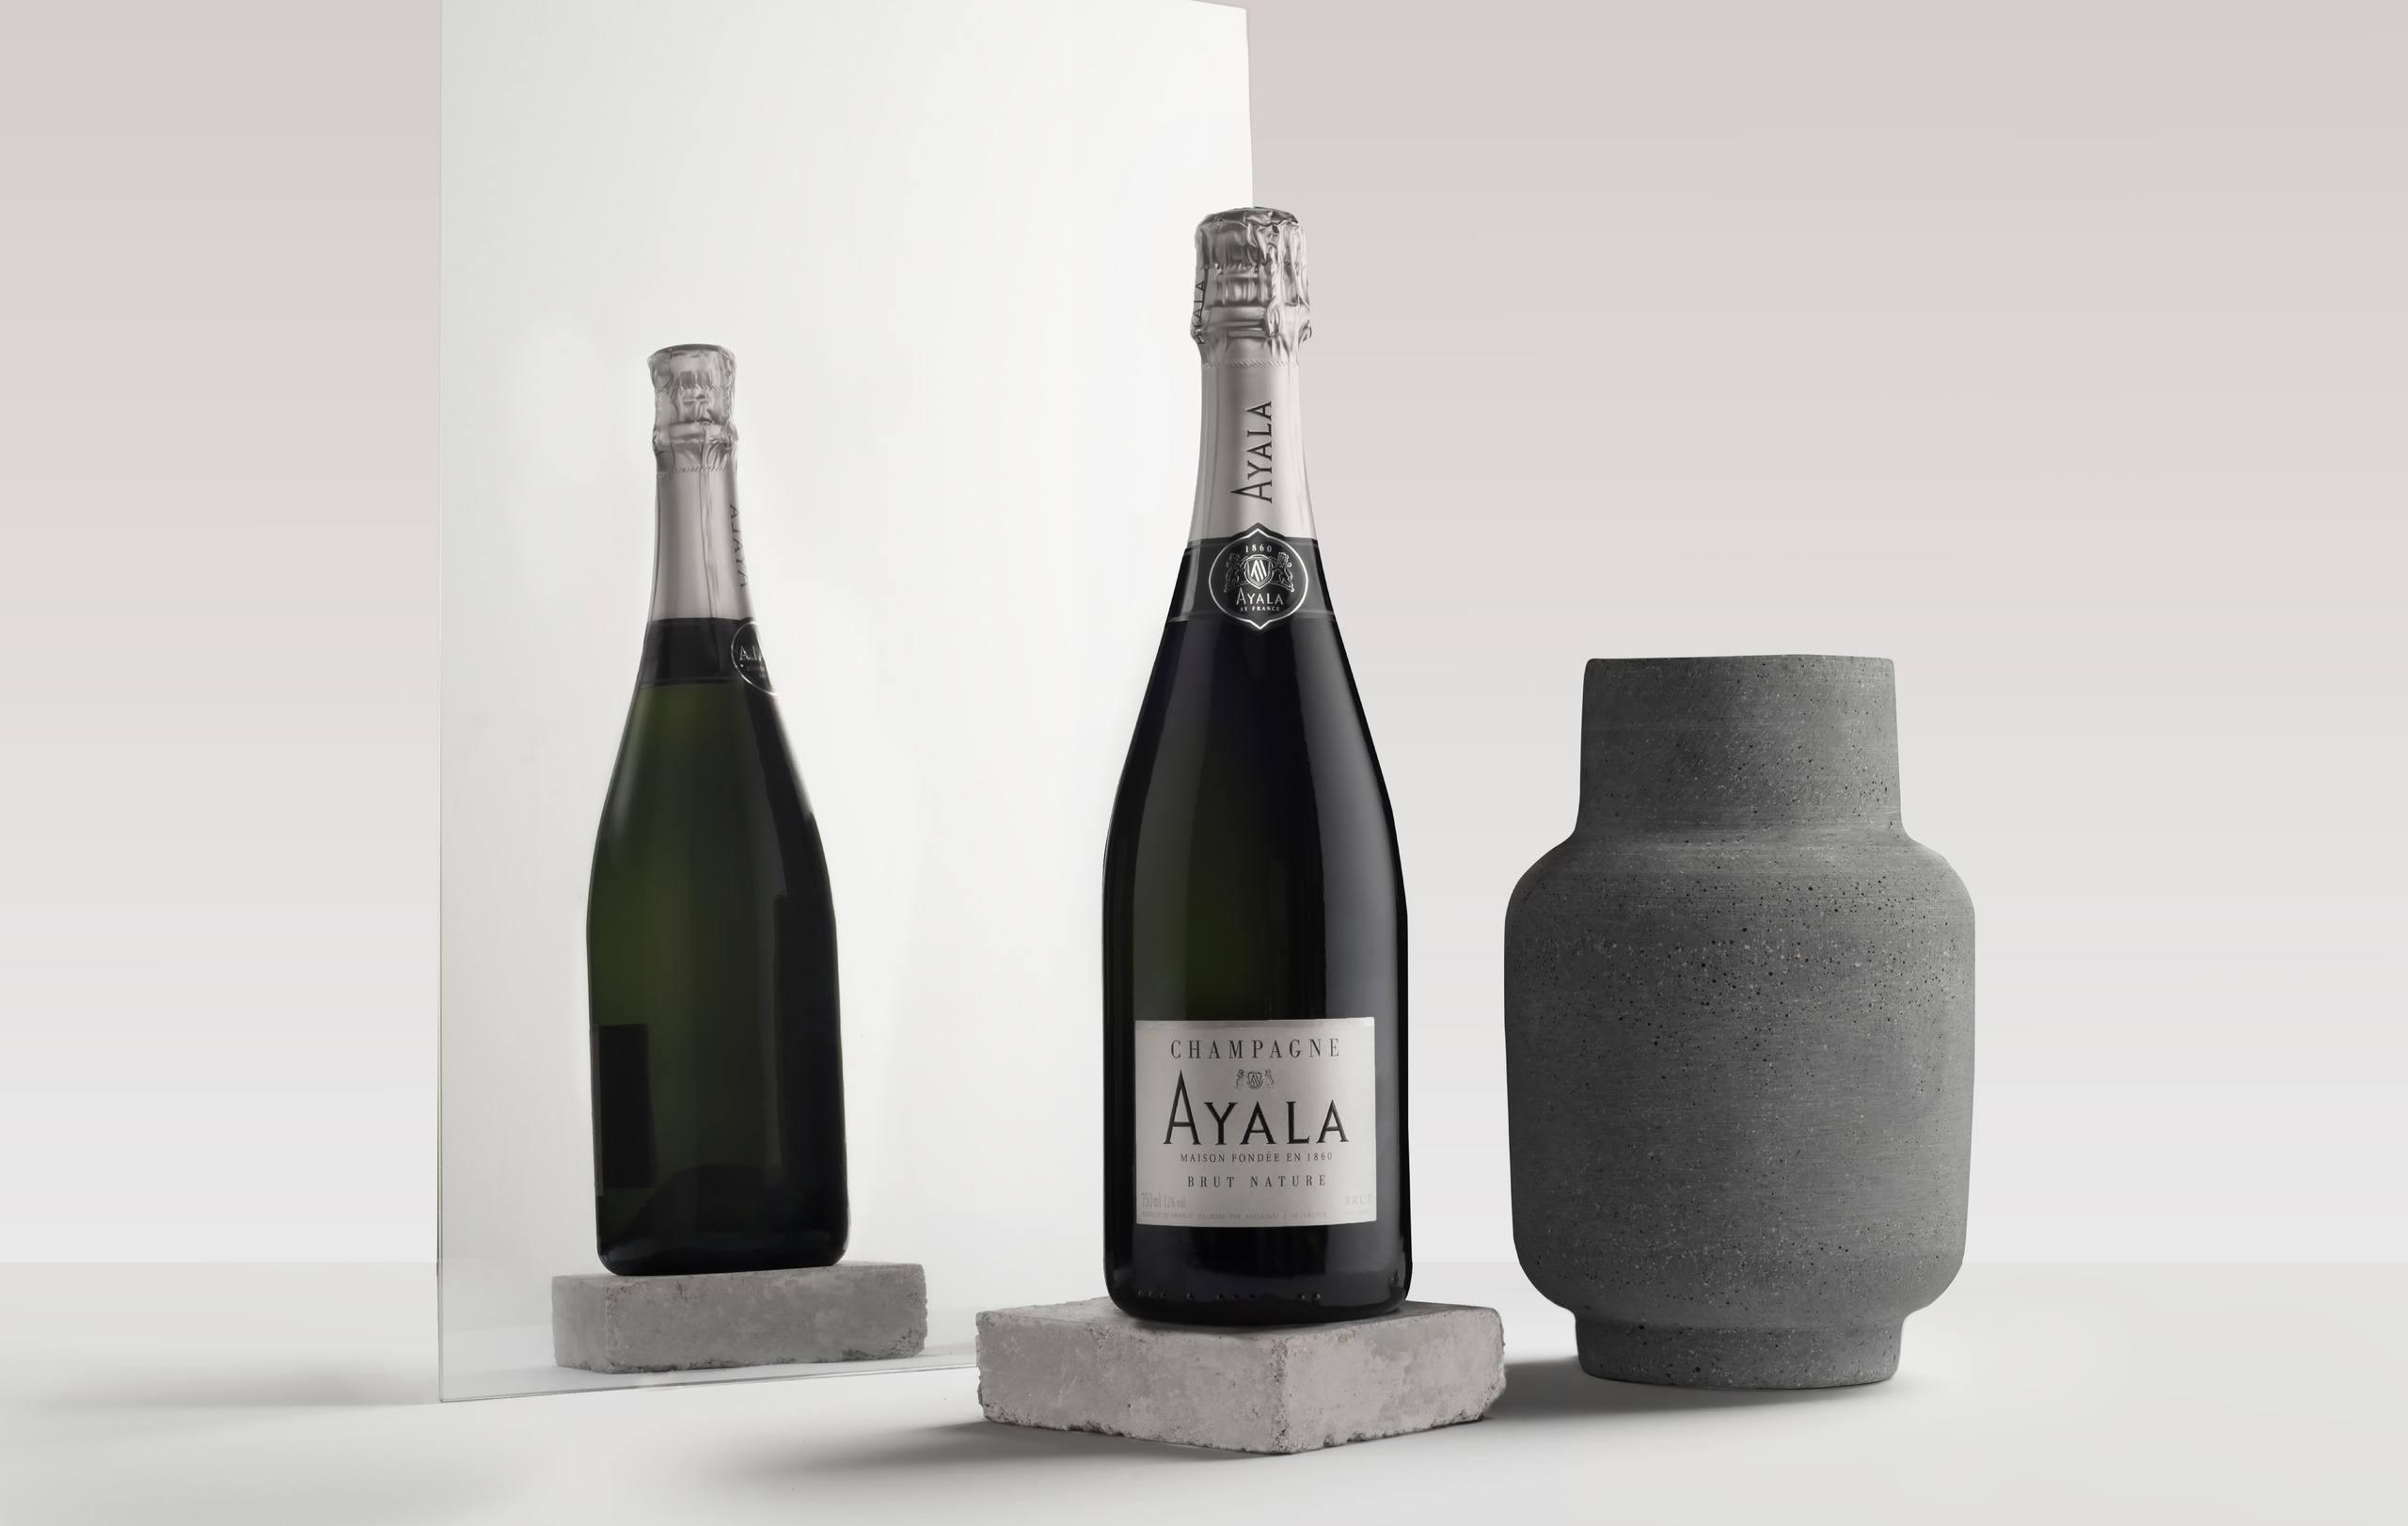 Brut Majeur - Champagne Ayala